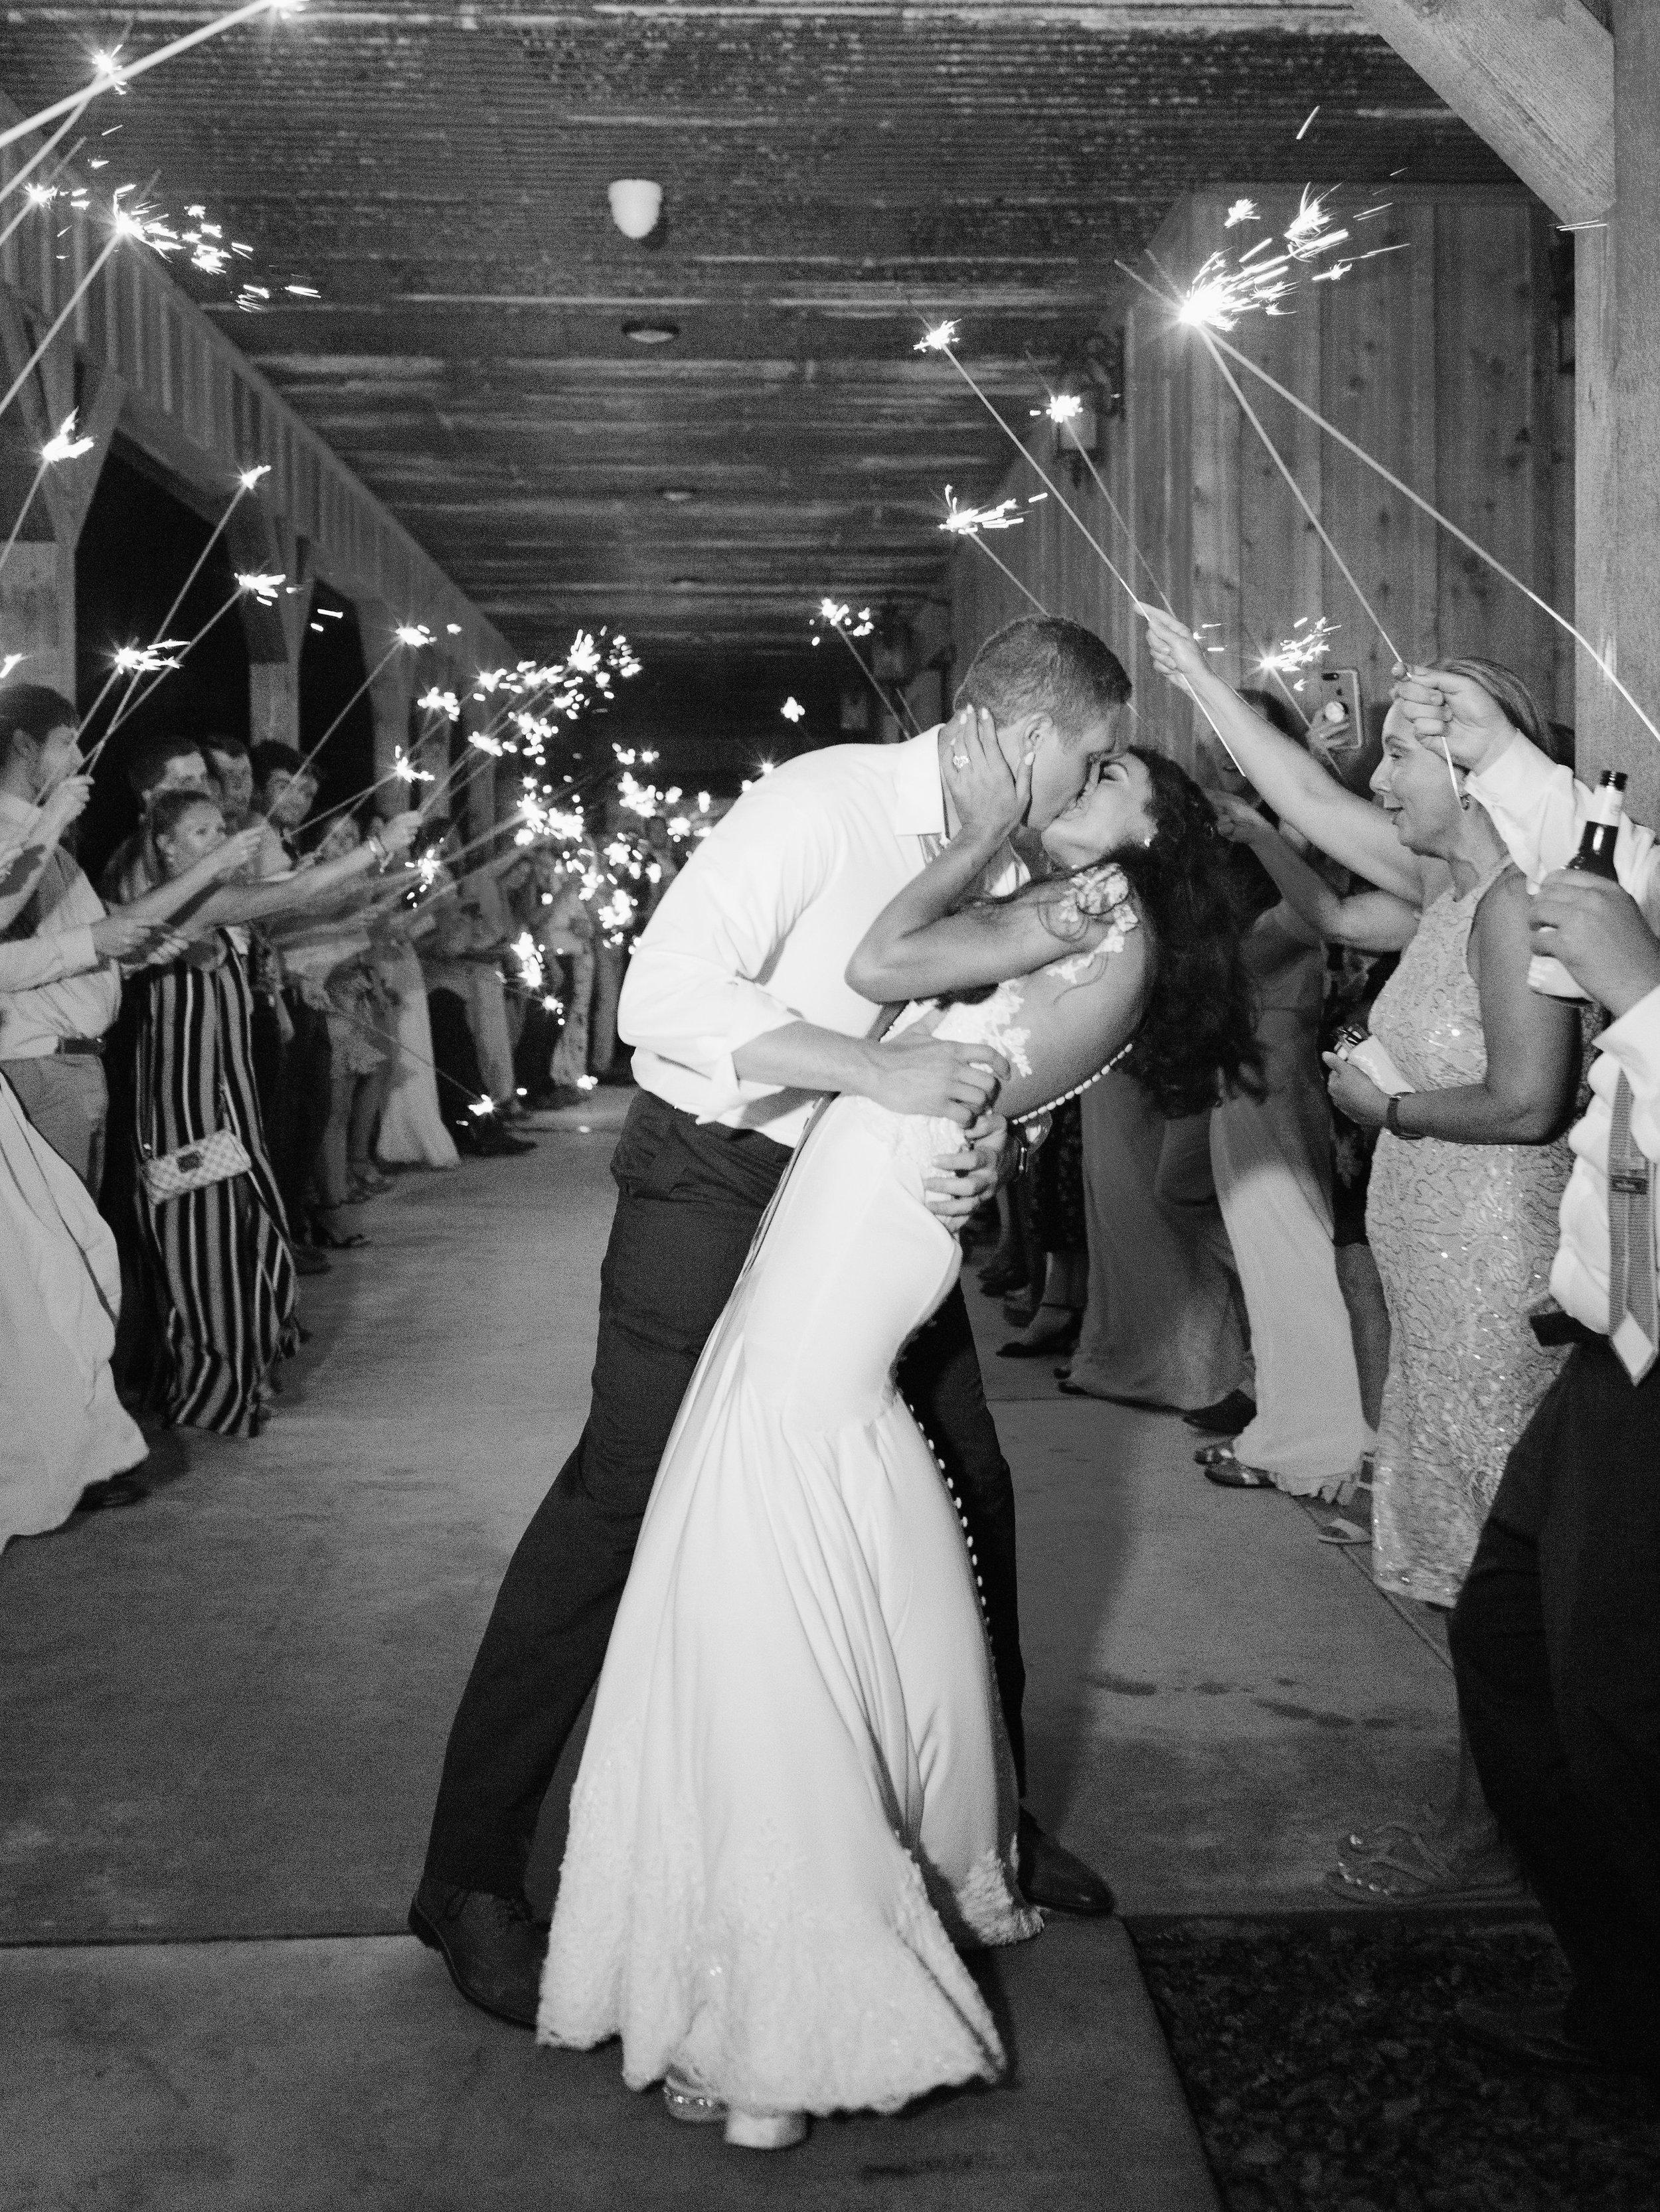 jessica-zimmerman-events-arkansas-wedding-sparkler-exit.jpg